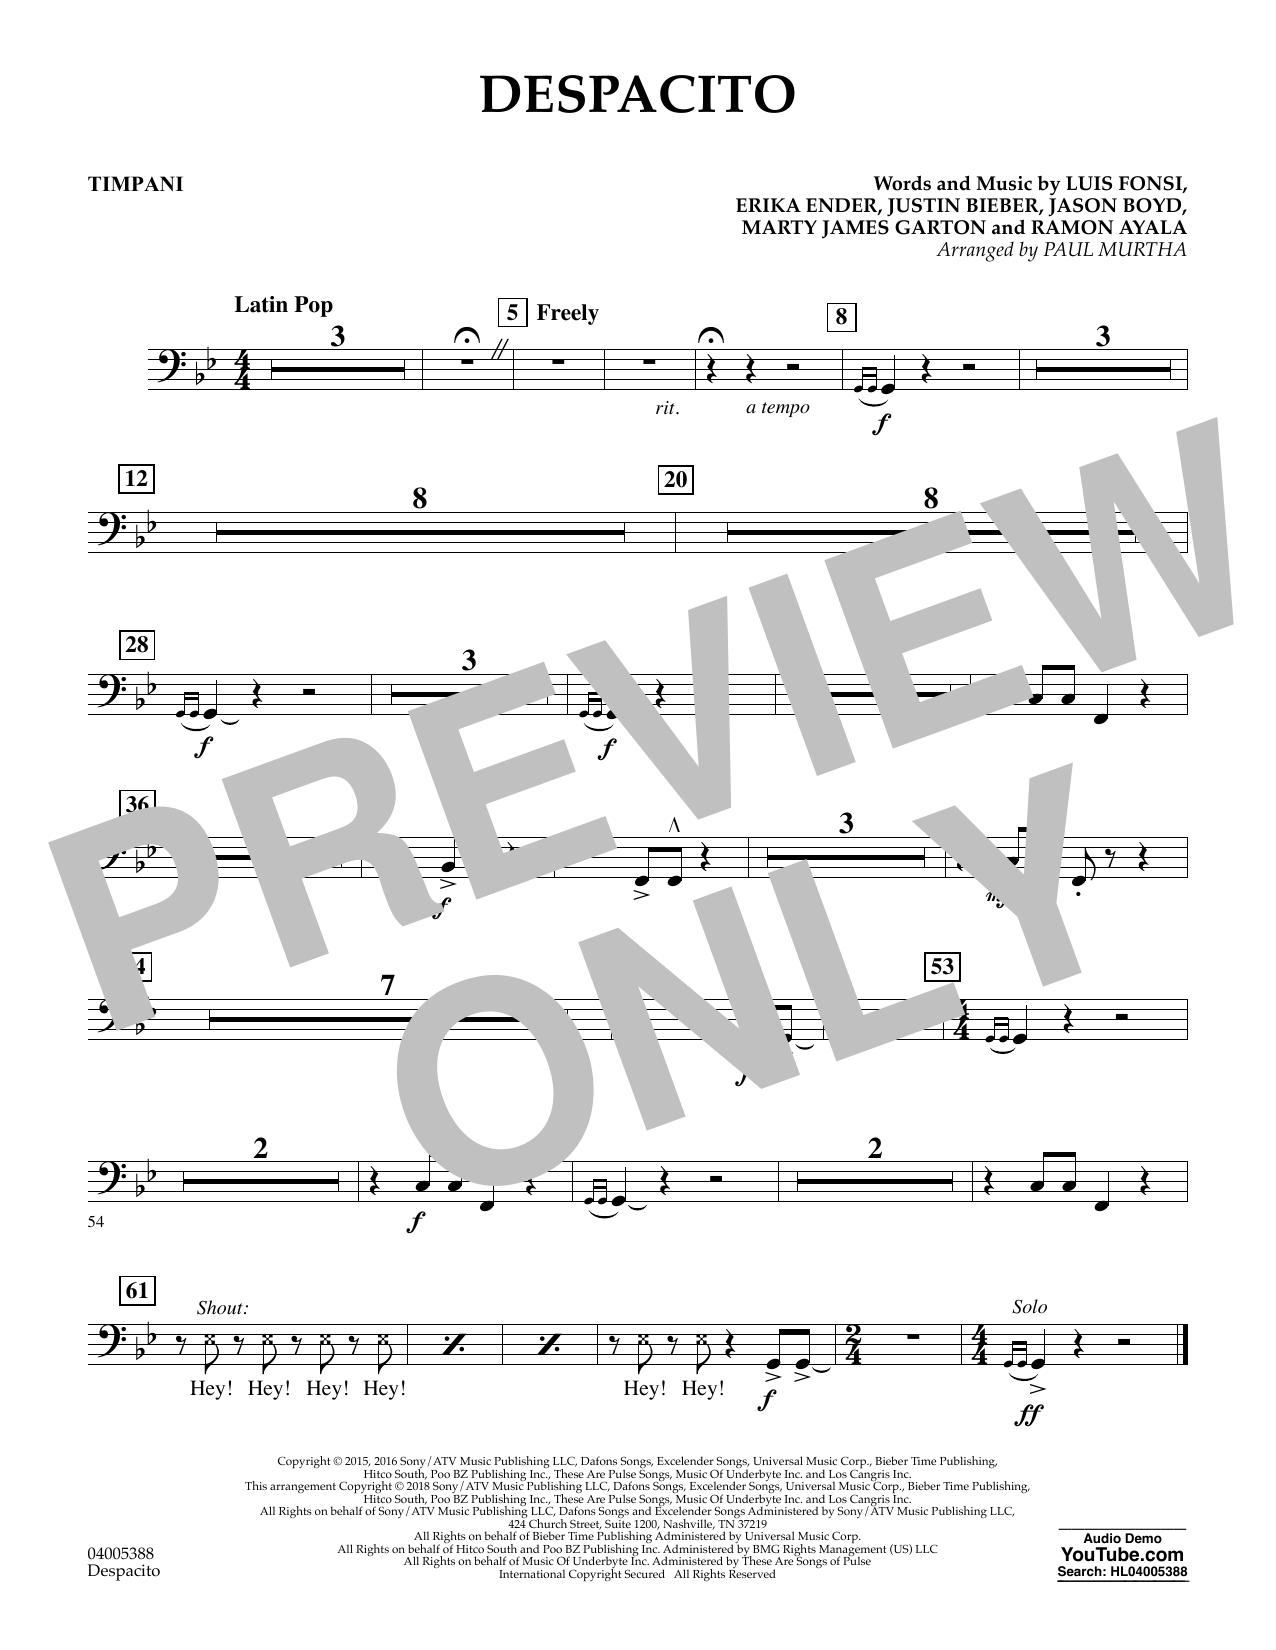 Despacito (arr. Paul Murtha) - Timpani (Concert Band)